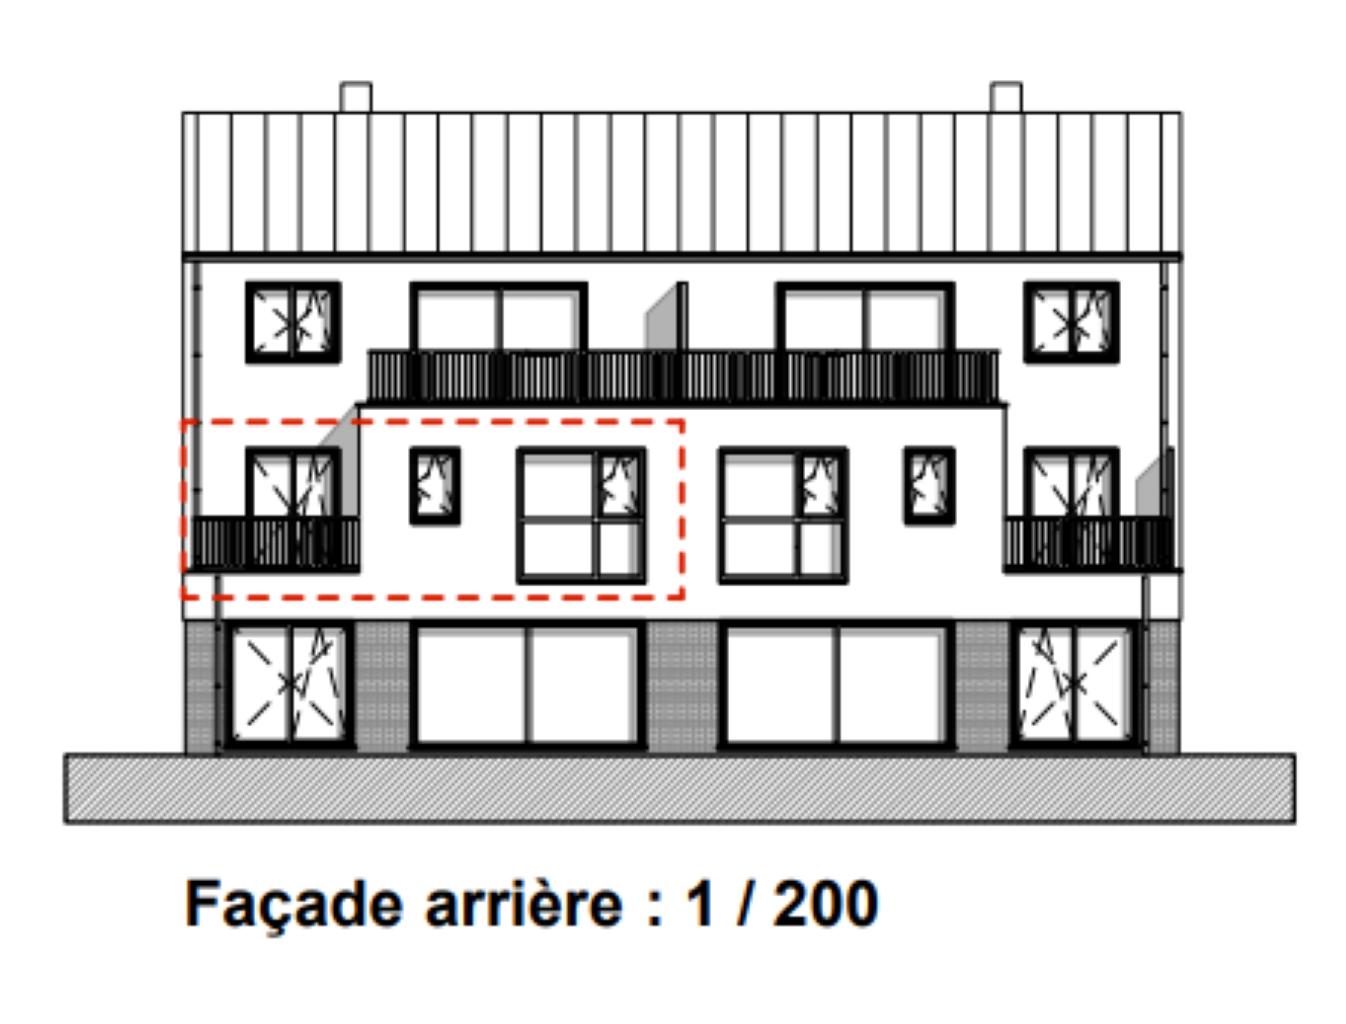 Appartement - Rebecq Quenast - #3632729-3